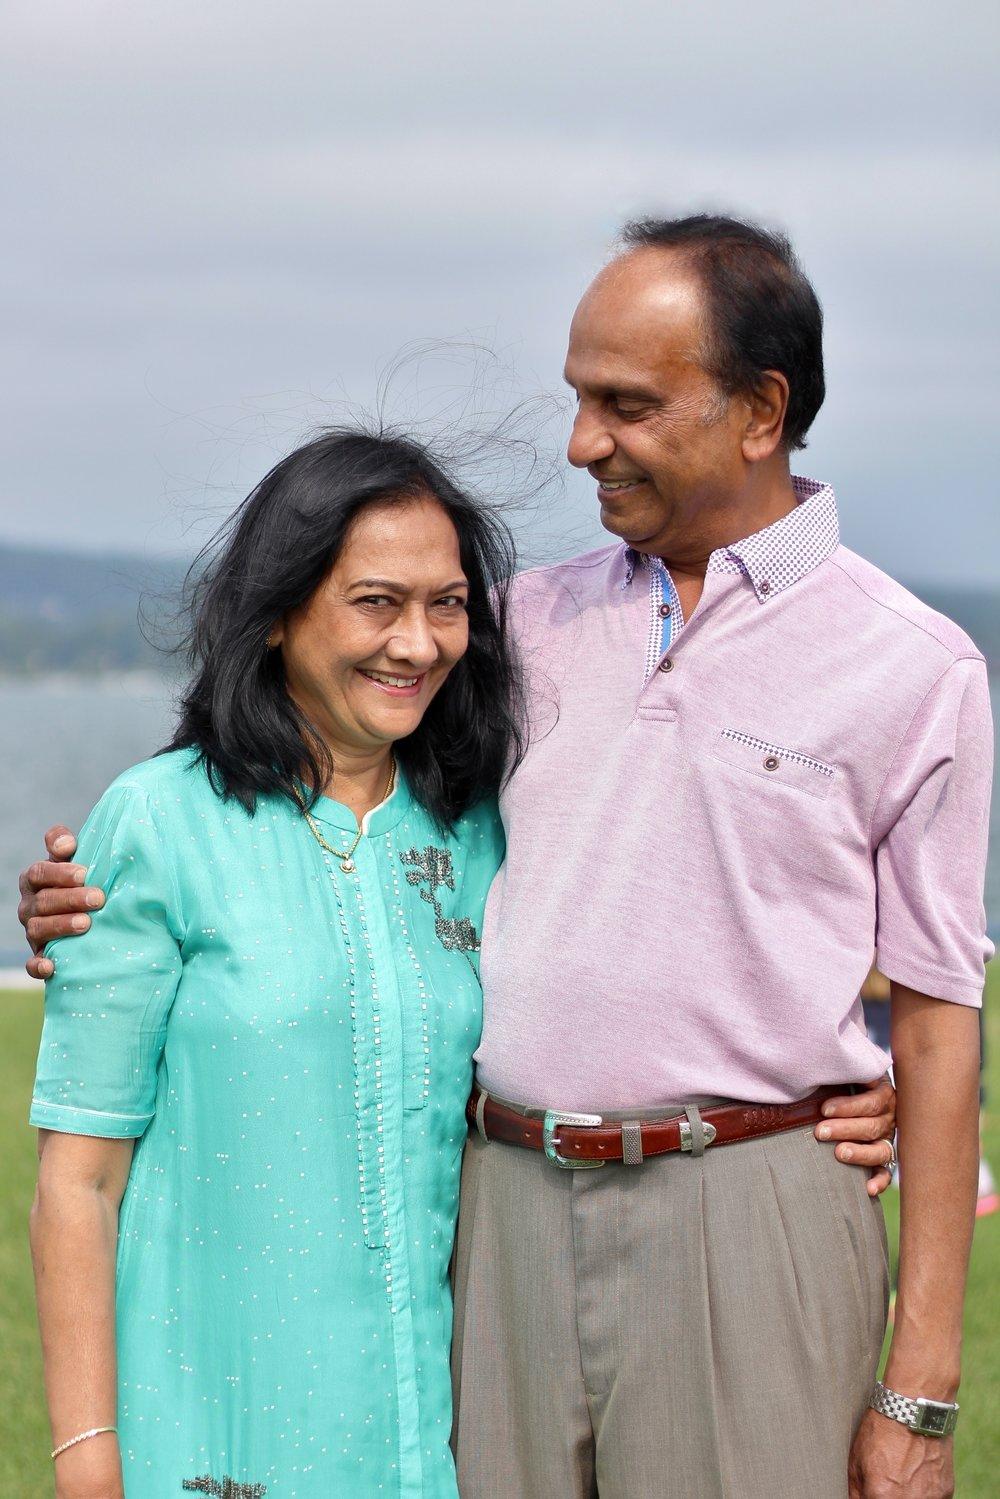 Patel Family Traverse City August 2018 (19).JPG